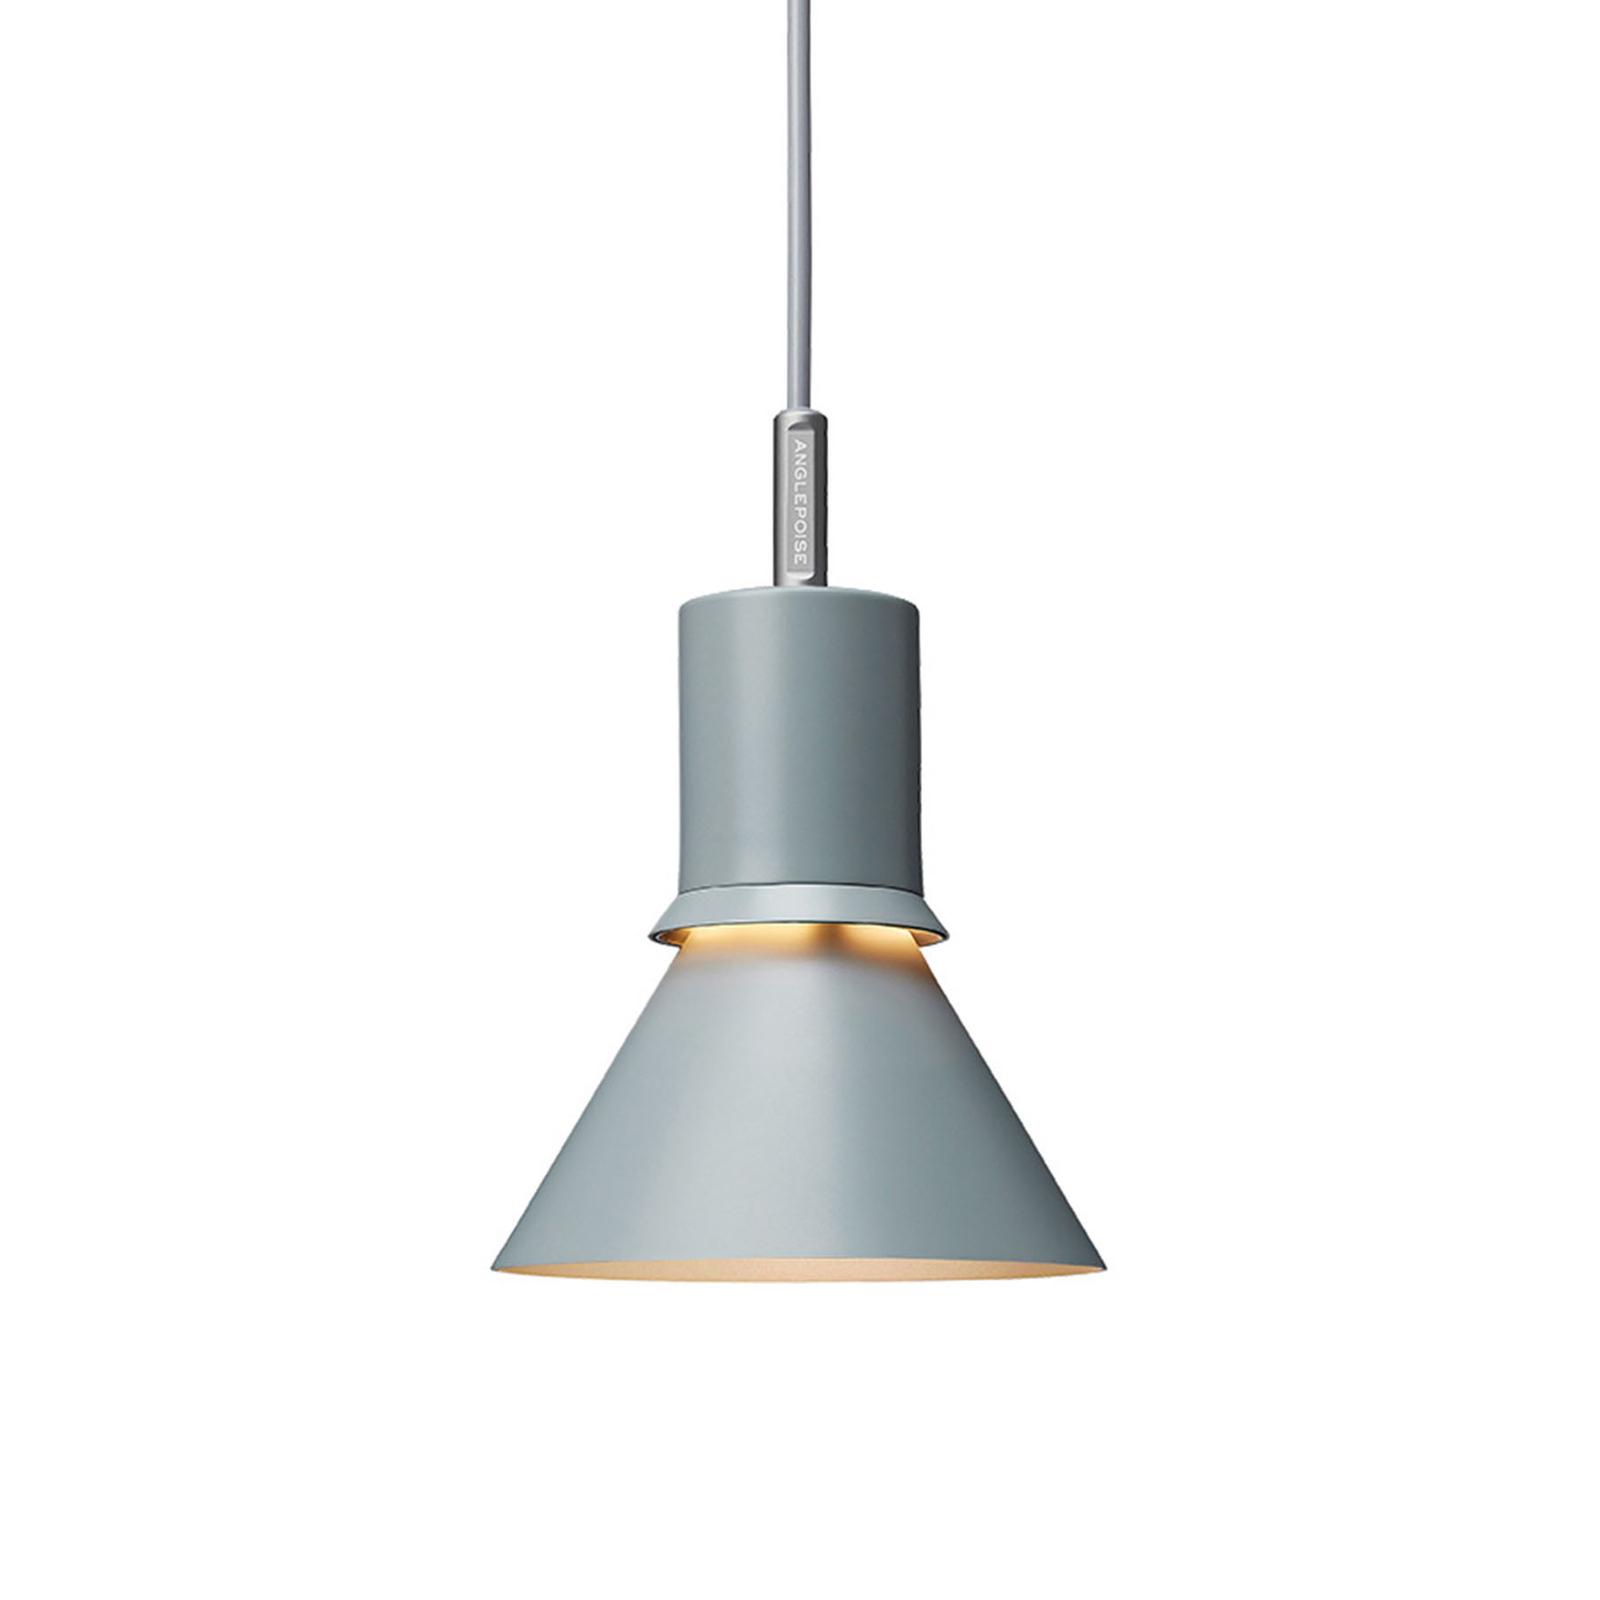 Anglepoise Type 80 hængelampe, tågegrå